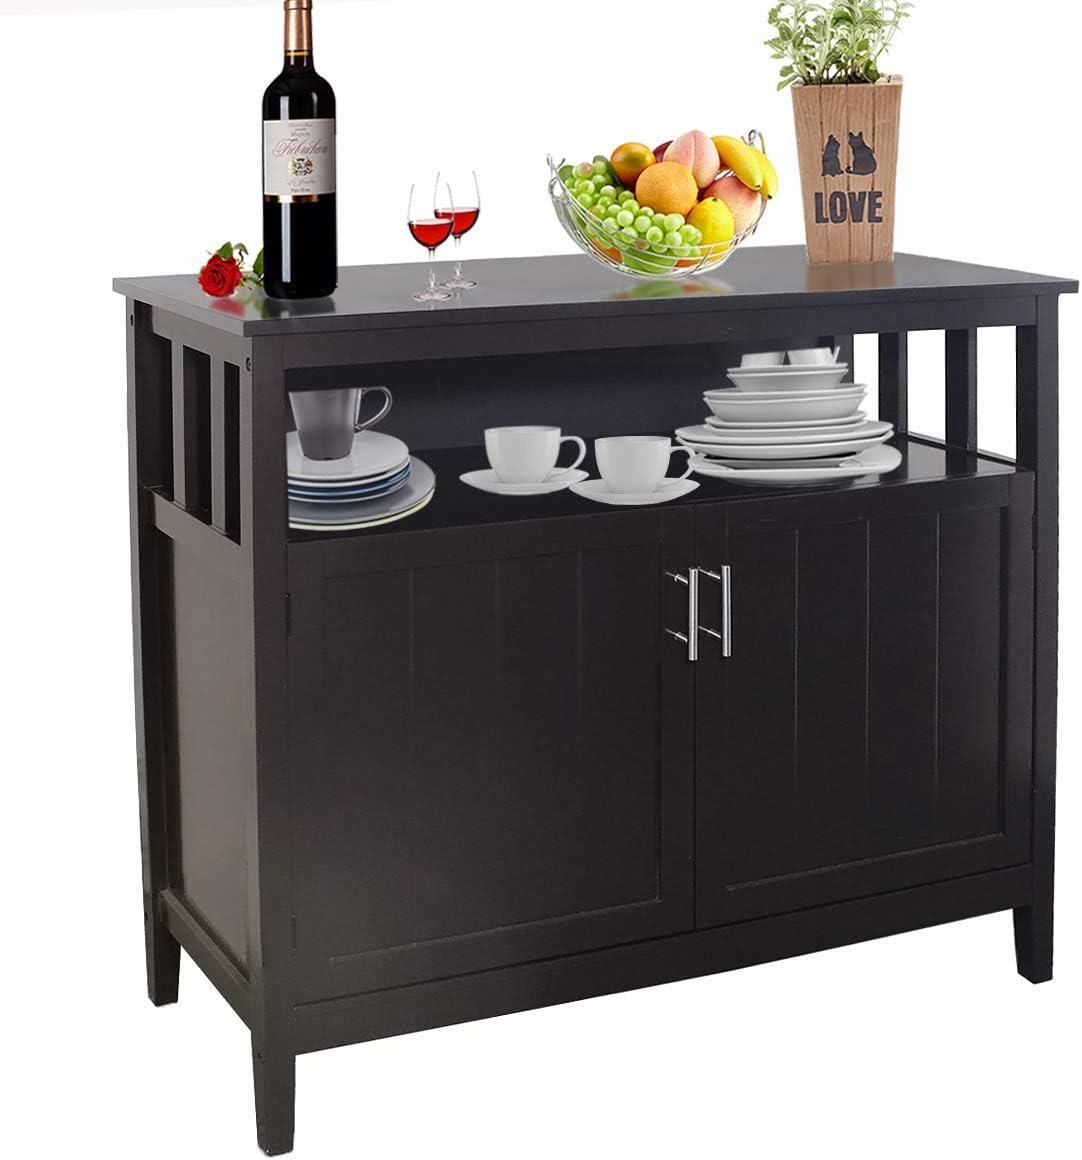 Buffet Cabinet Kitchen Sideboard Storage Cabinet Free Standing Cupboard Adjustable Shelf Brown Brown